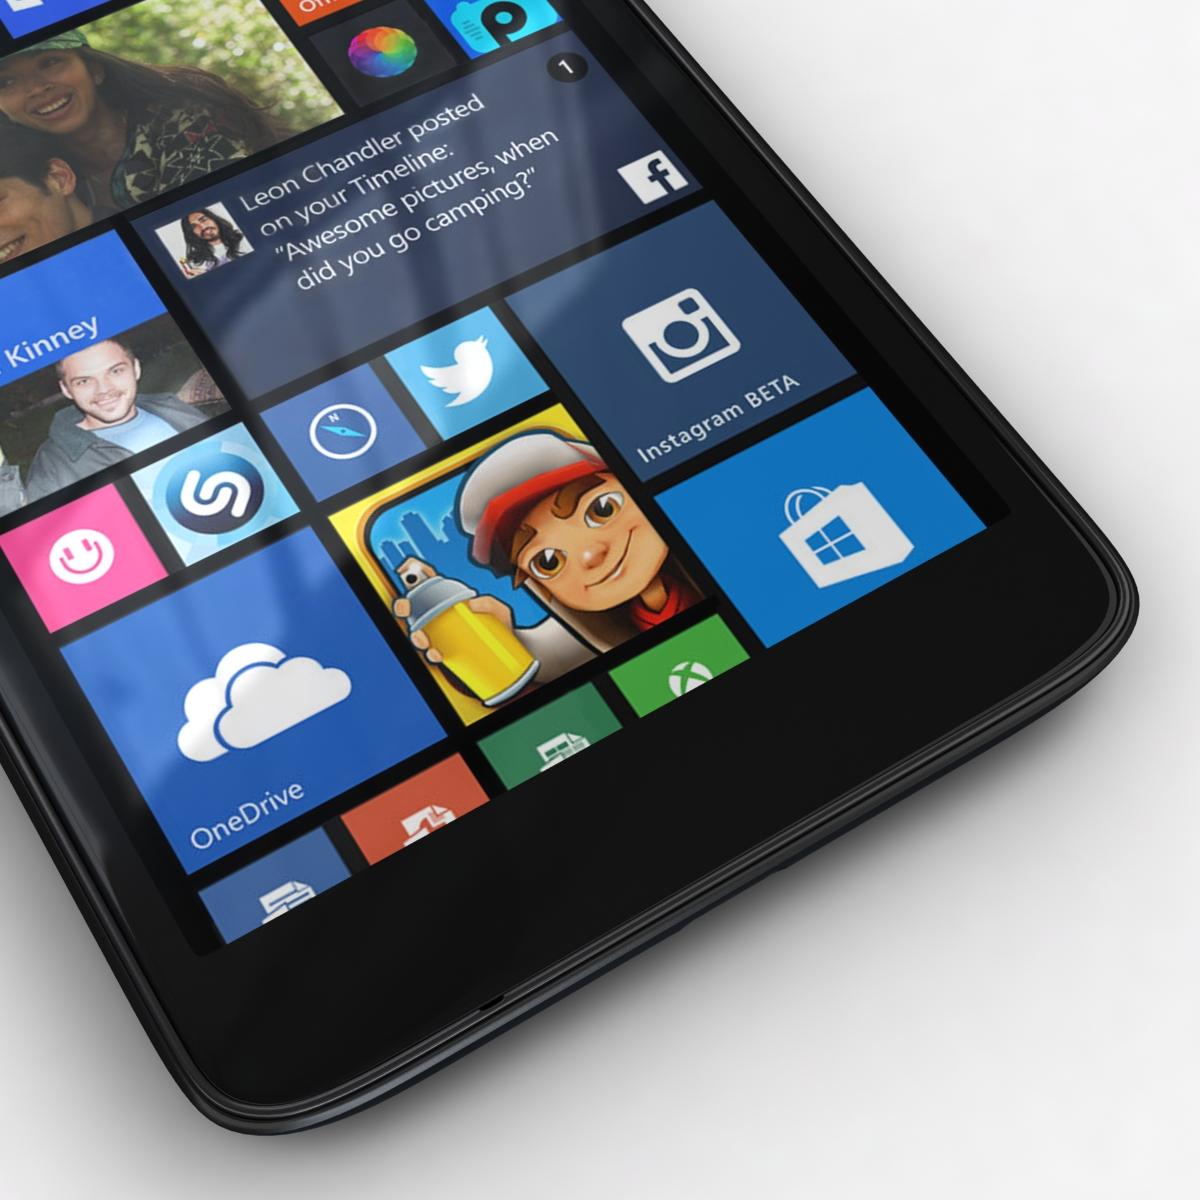 microsoft lumia 535 and dual sim black 3d model 3ds max fbx c4d obj 204354